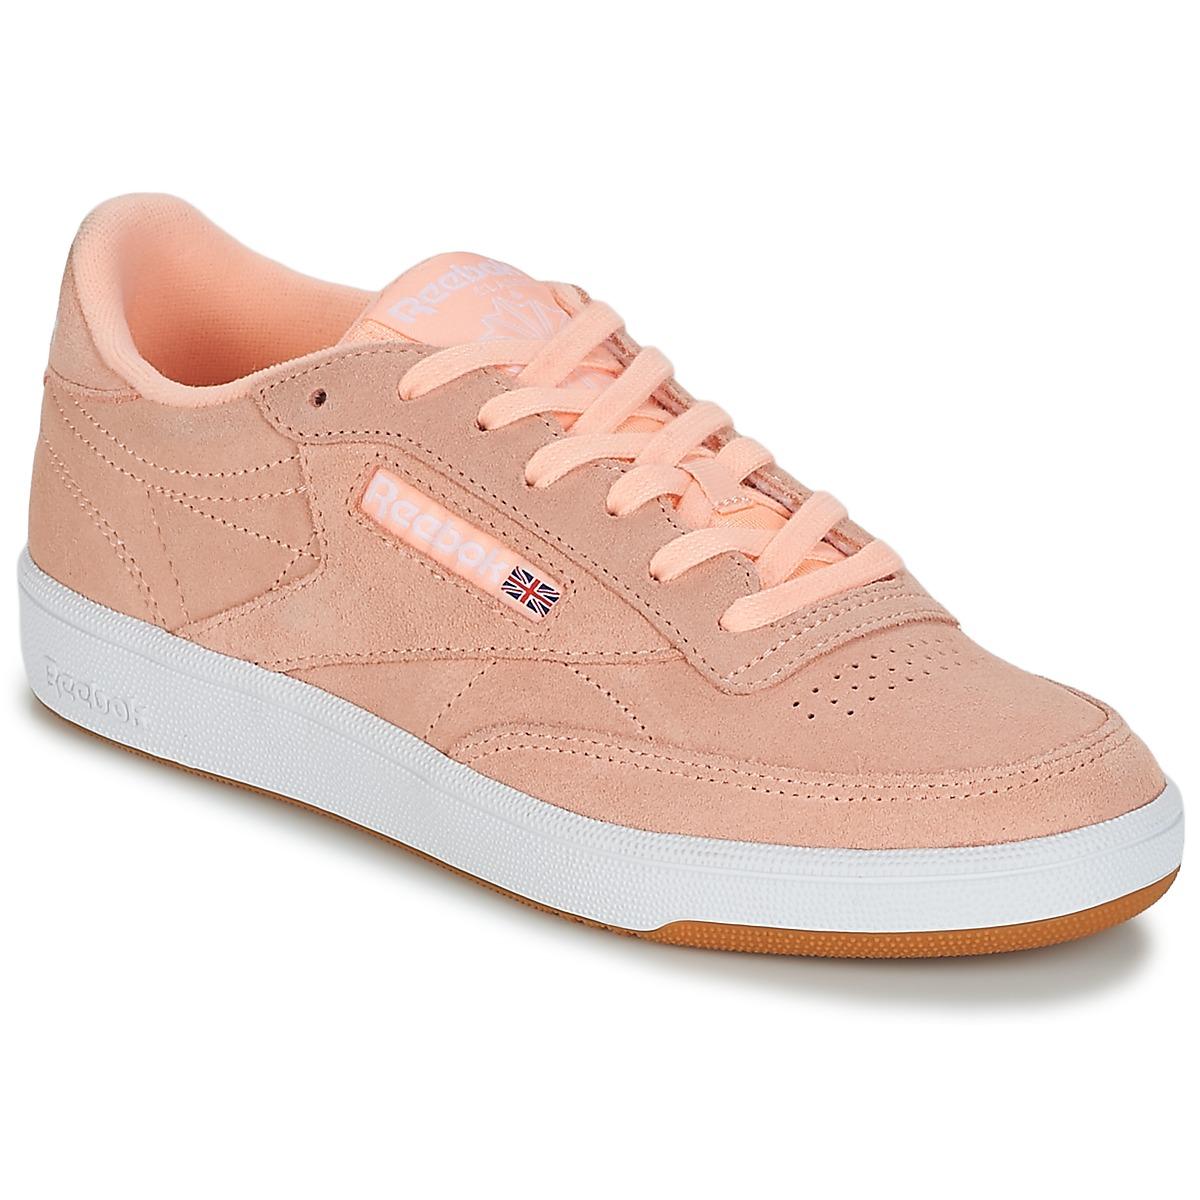 Reebok Classic CLUB C 85 Rose - Kostenloser Versand bei Spartoode ! - Schuhe Sneaker Low Damen 79,95 €